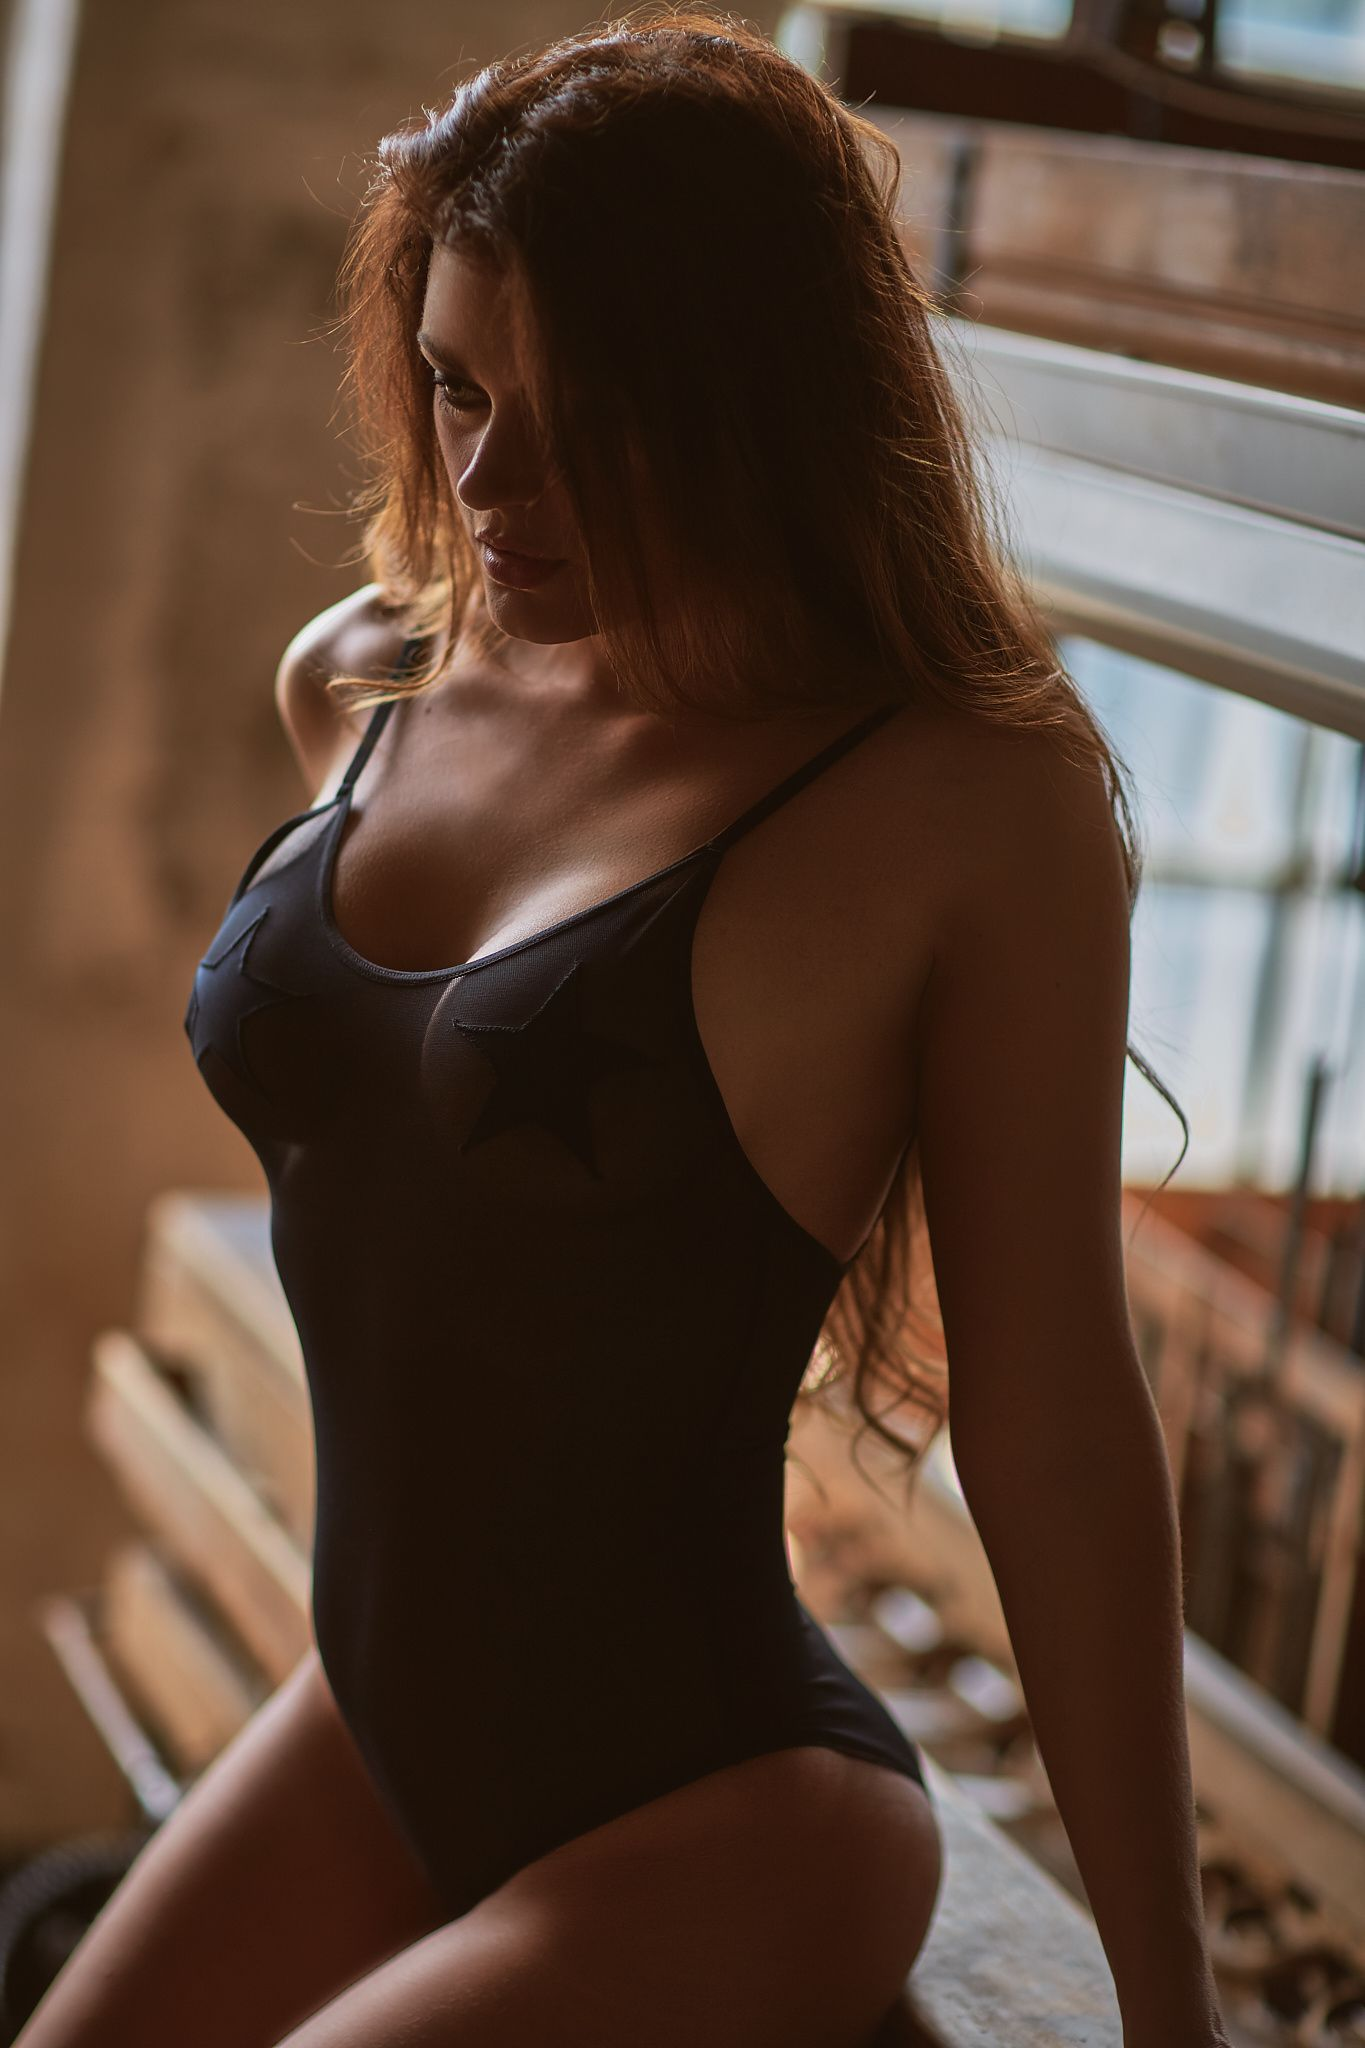 Fappening Hot Christina Braun naked photo 2017